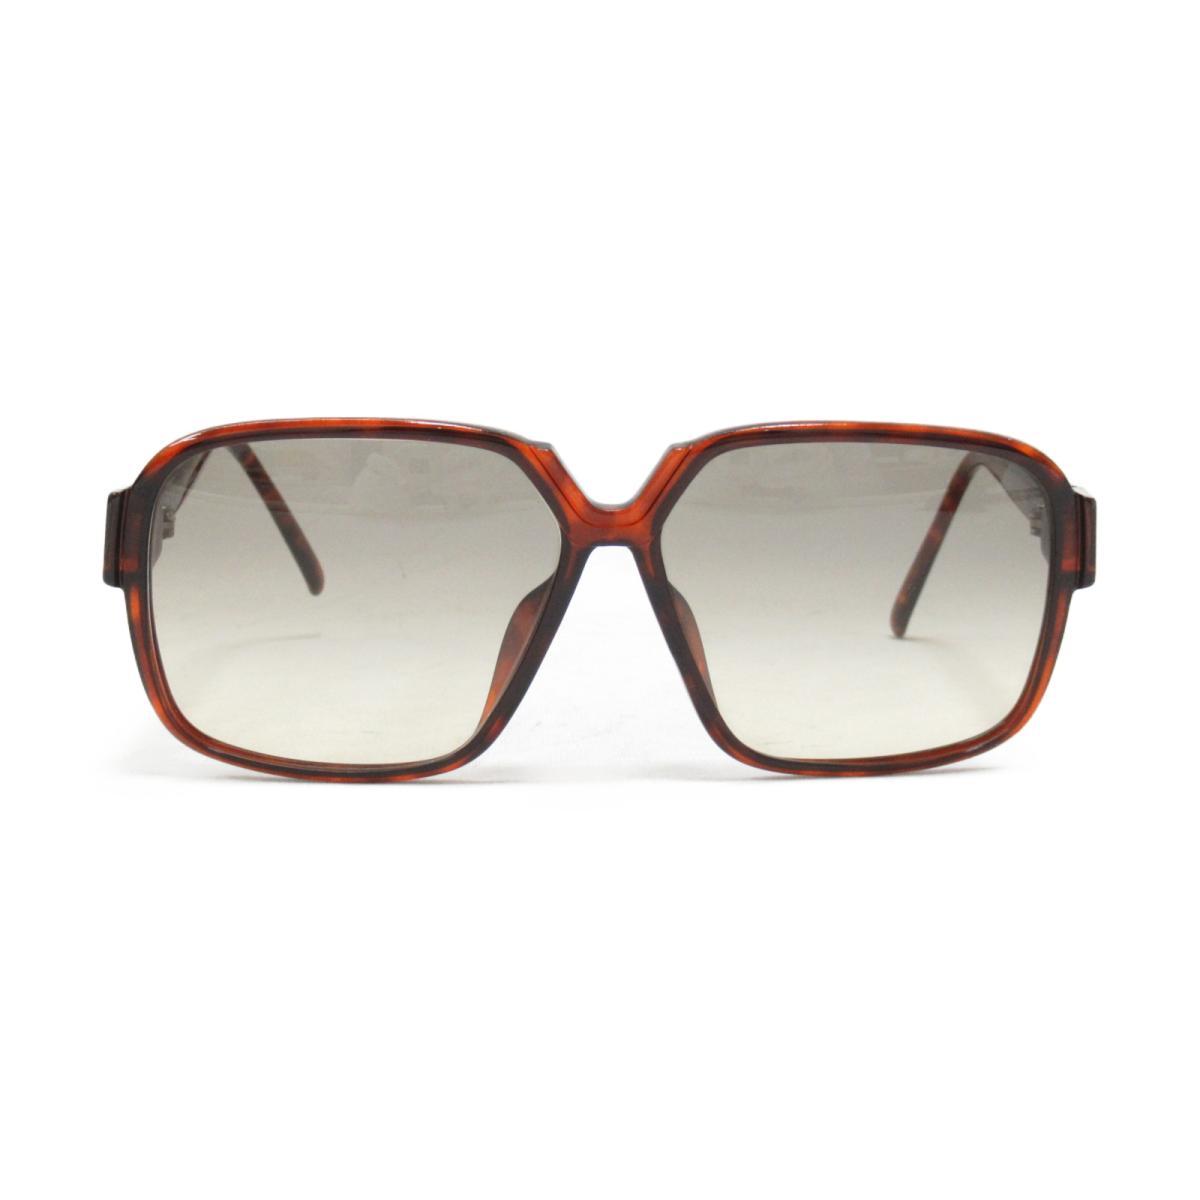 6b2cbe244b3c2 Christian Dior sunglasses accessories Lady s plastic brown x red (2181A11)